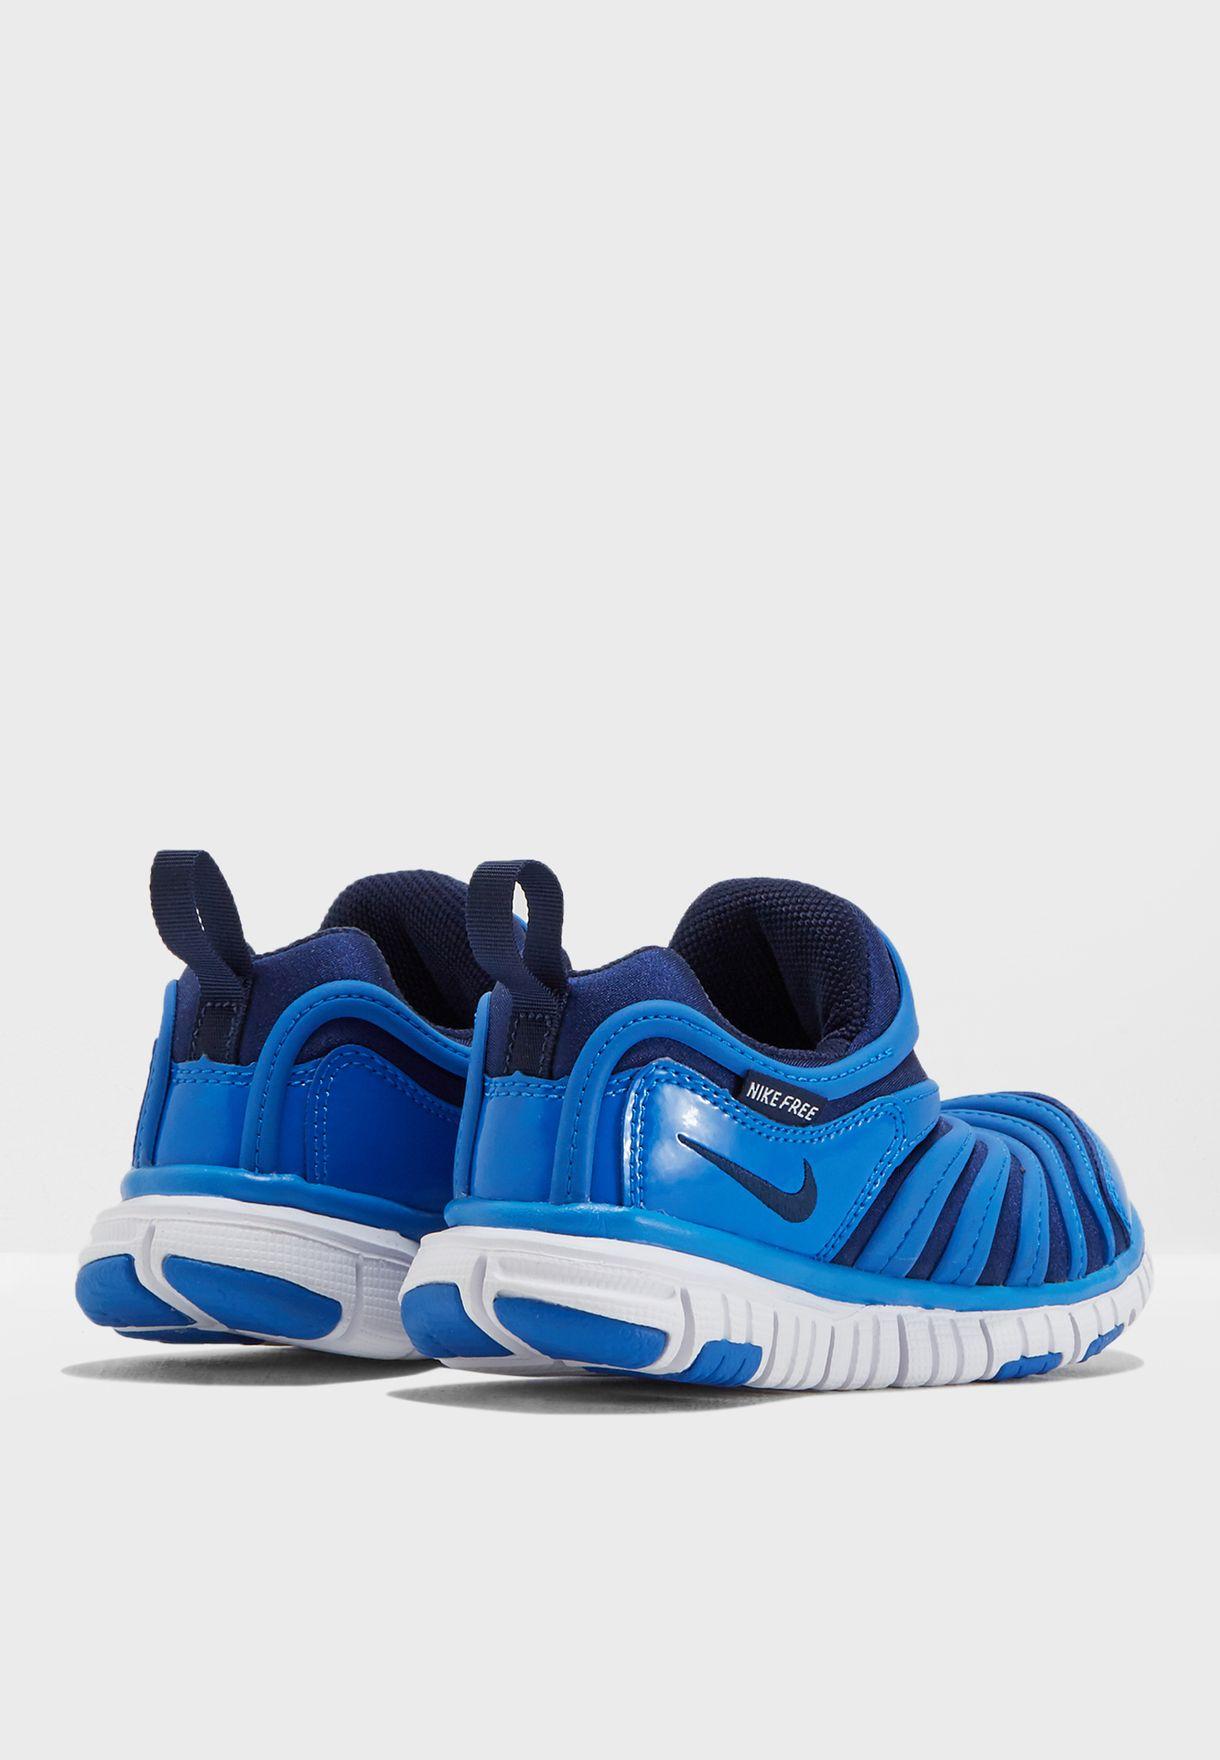 66b5e58a0a410 Shop Nike blue Kids Dynamo Free 343738-426 for Kids in Saudi ...